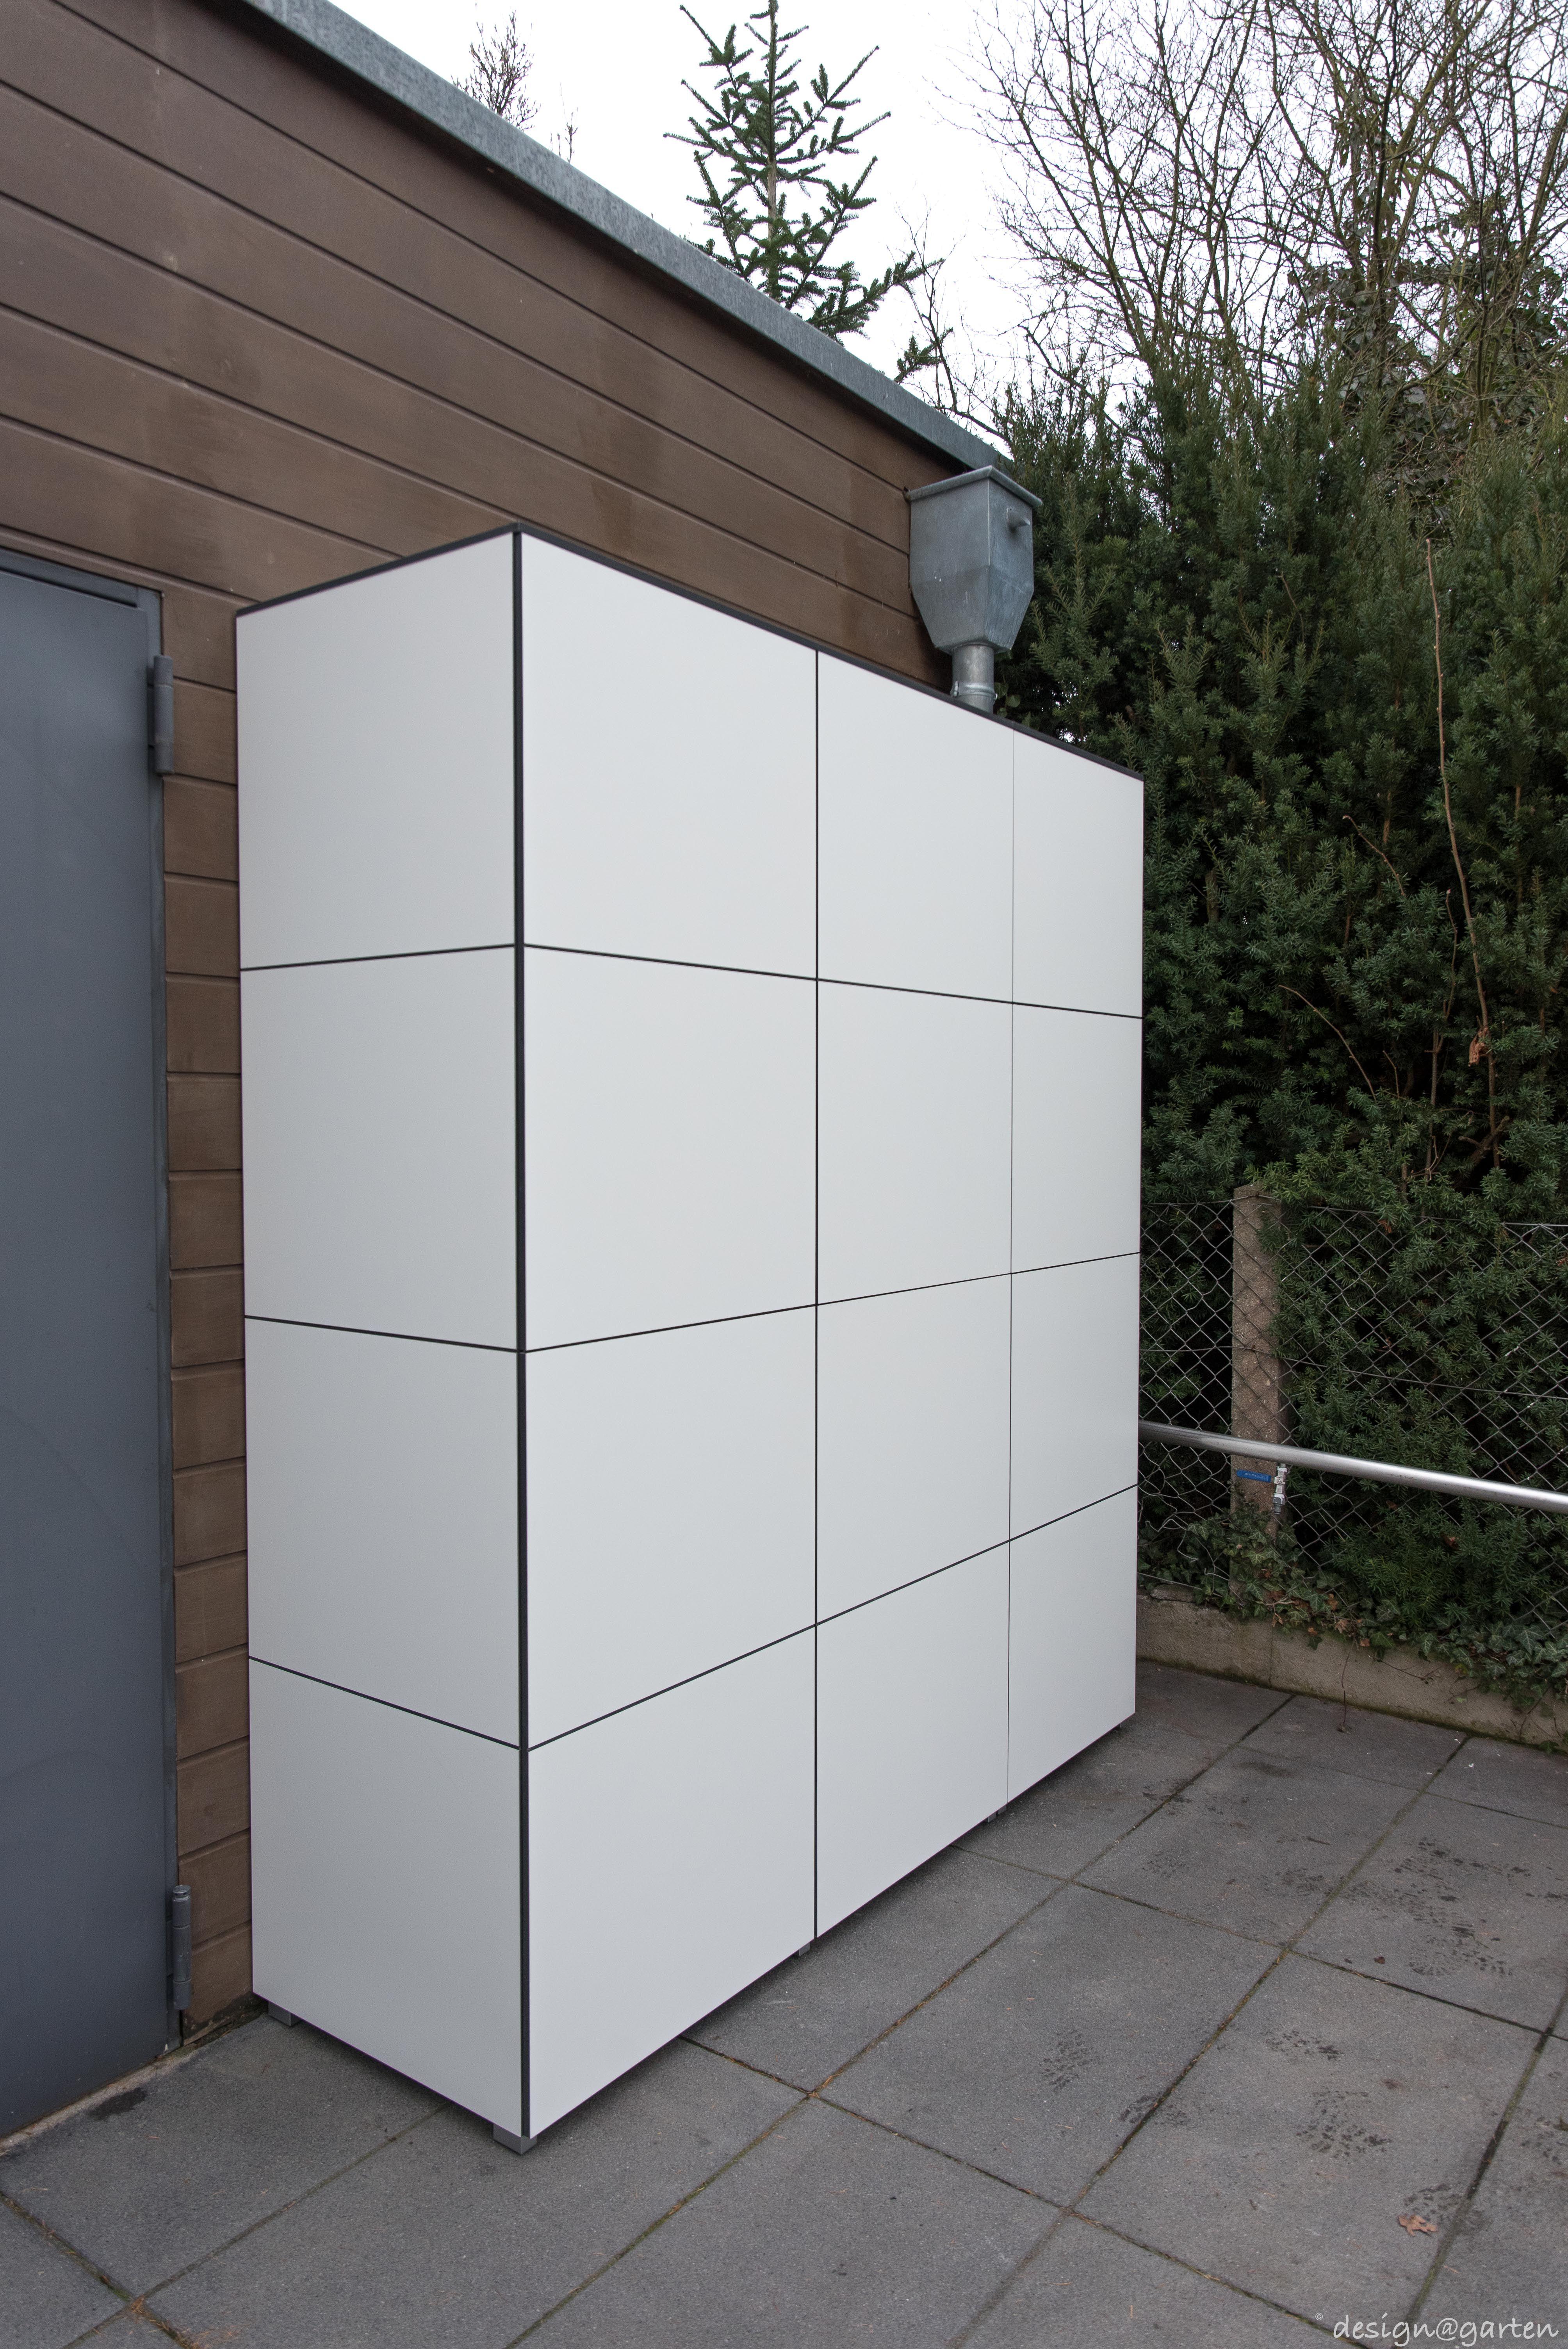 Grillschrank win by design garten augsburg germany terrassenschrank balk balkonschrank - Gartenhaus fassadenplatten ...